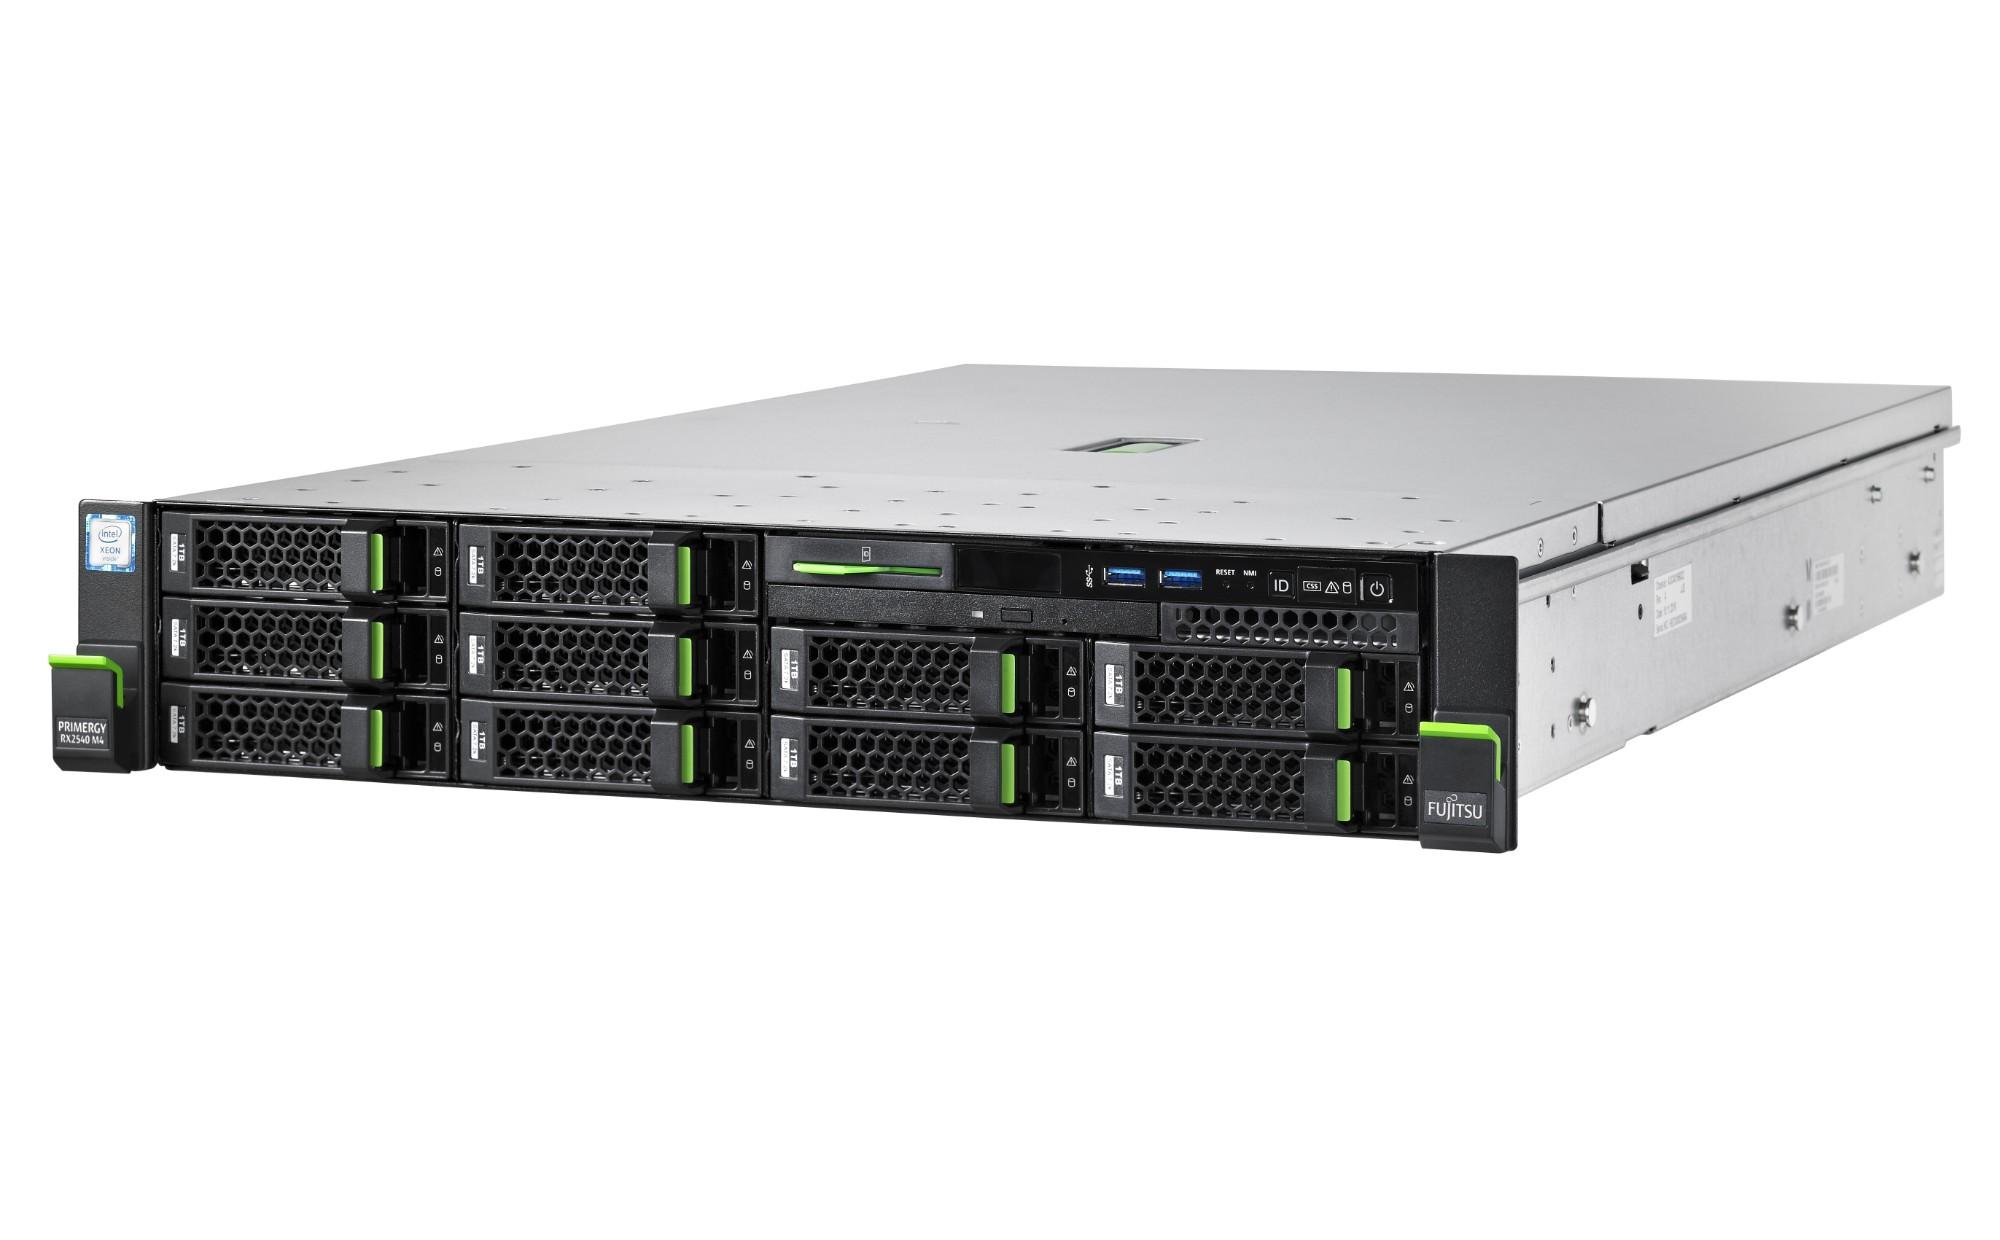 Fujitsu PRIMERGY RX2540 M4 1.8GHz 4108 450W Rack (2U) server